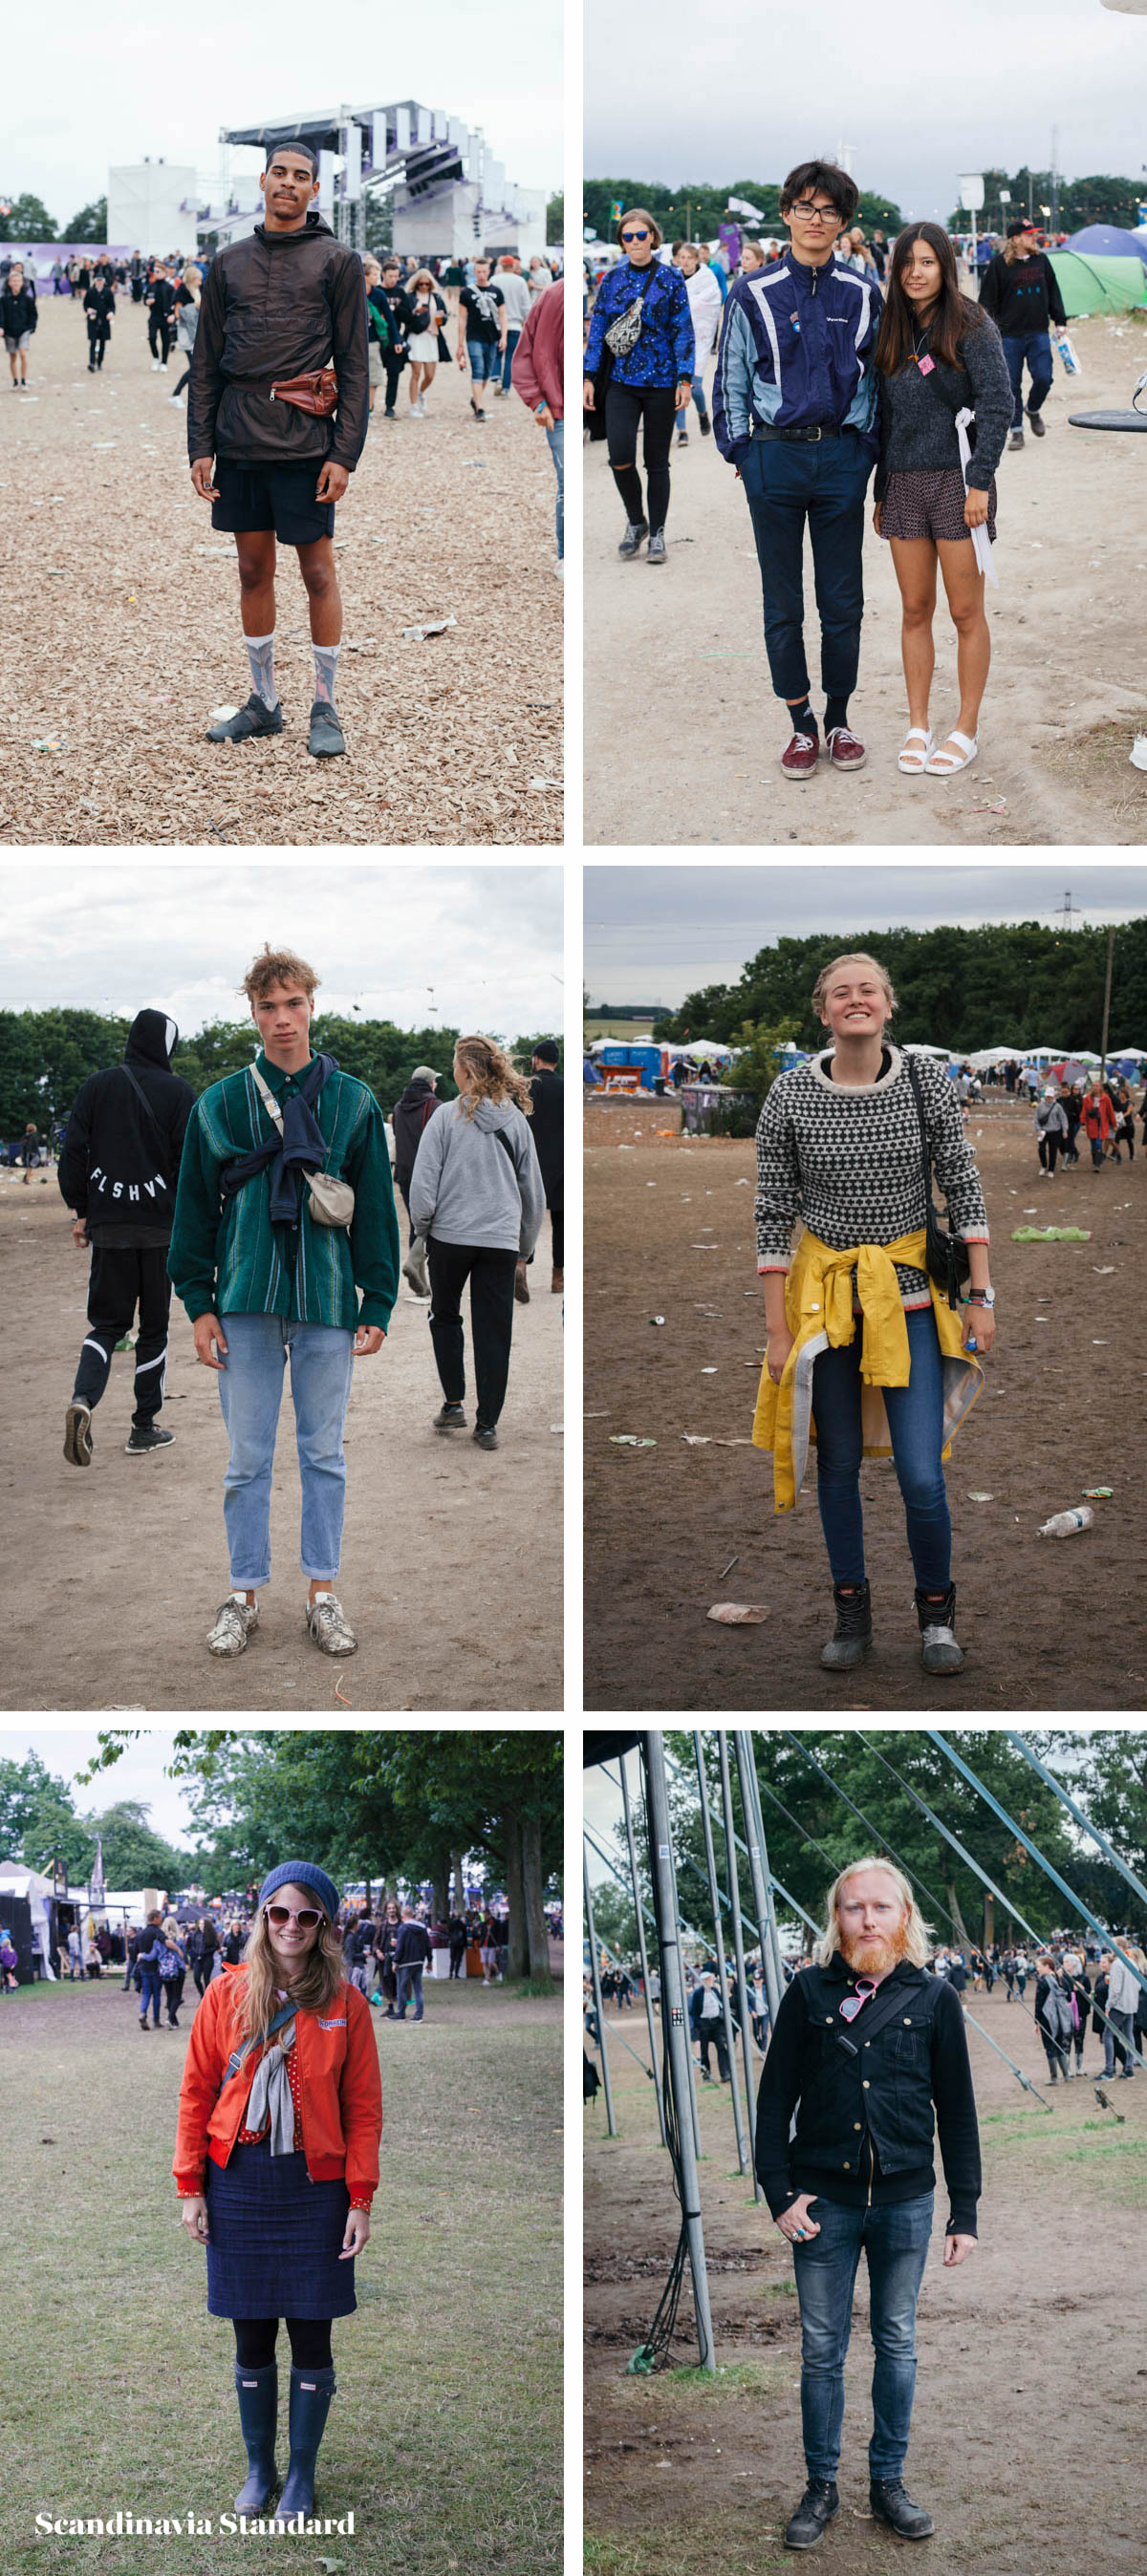 General Outfits - Scandinavia Standard